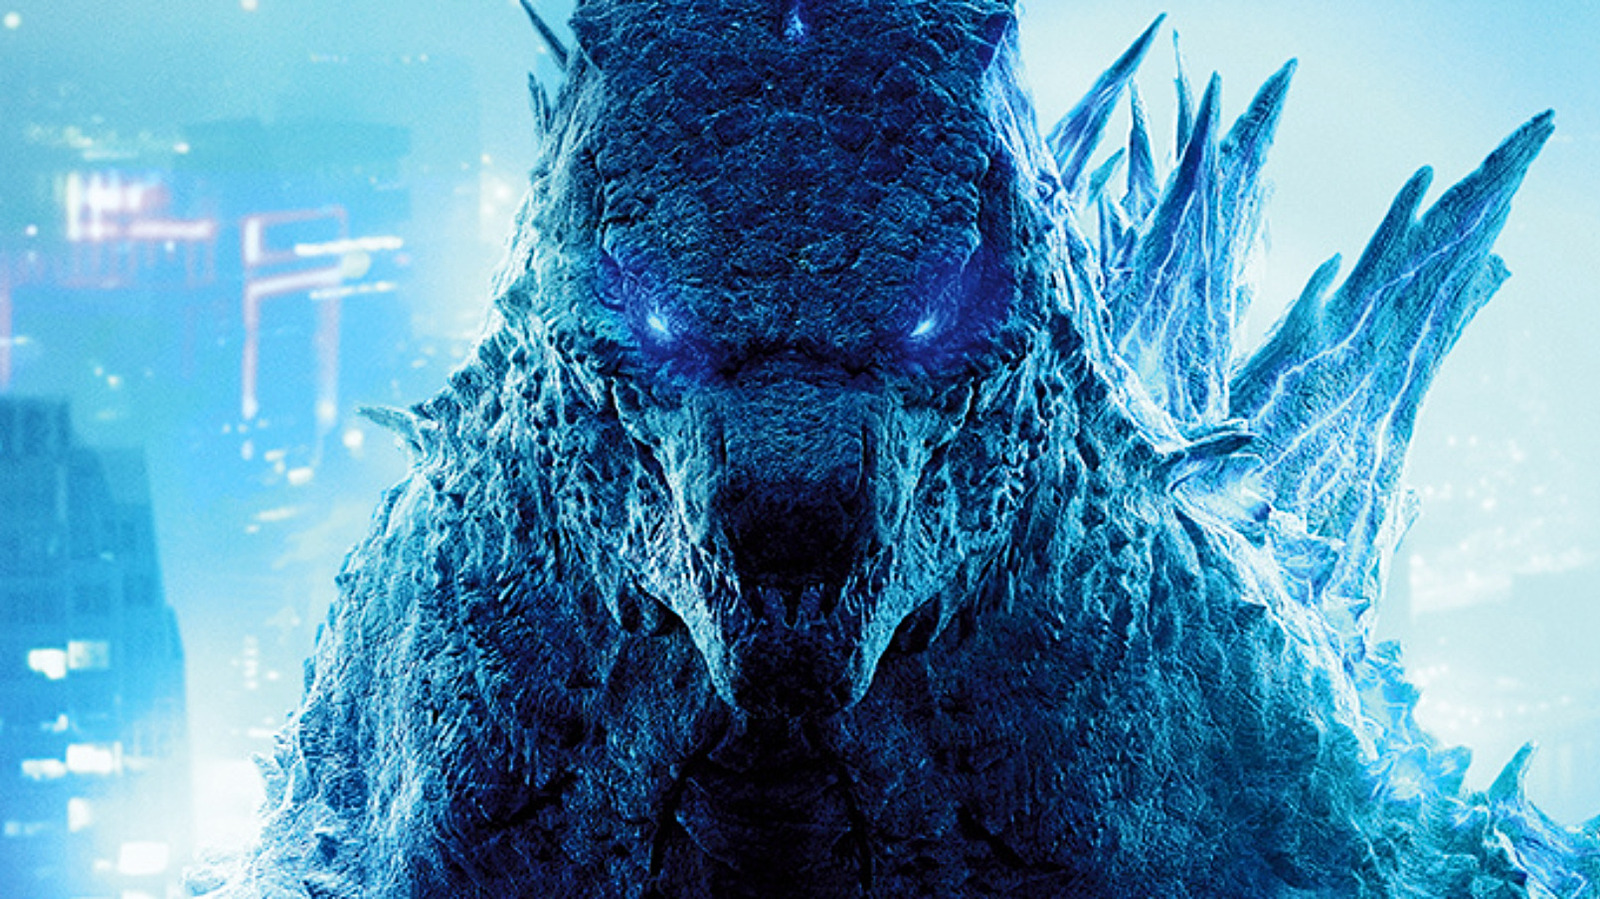 Godzilla Vs. Kong Works Around A Decades-Old Godzilla Rule